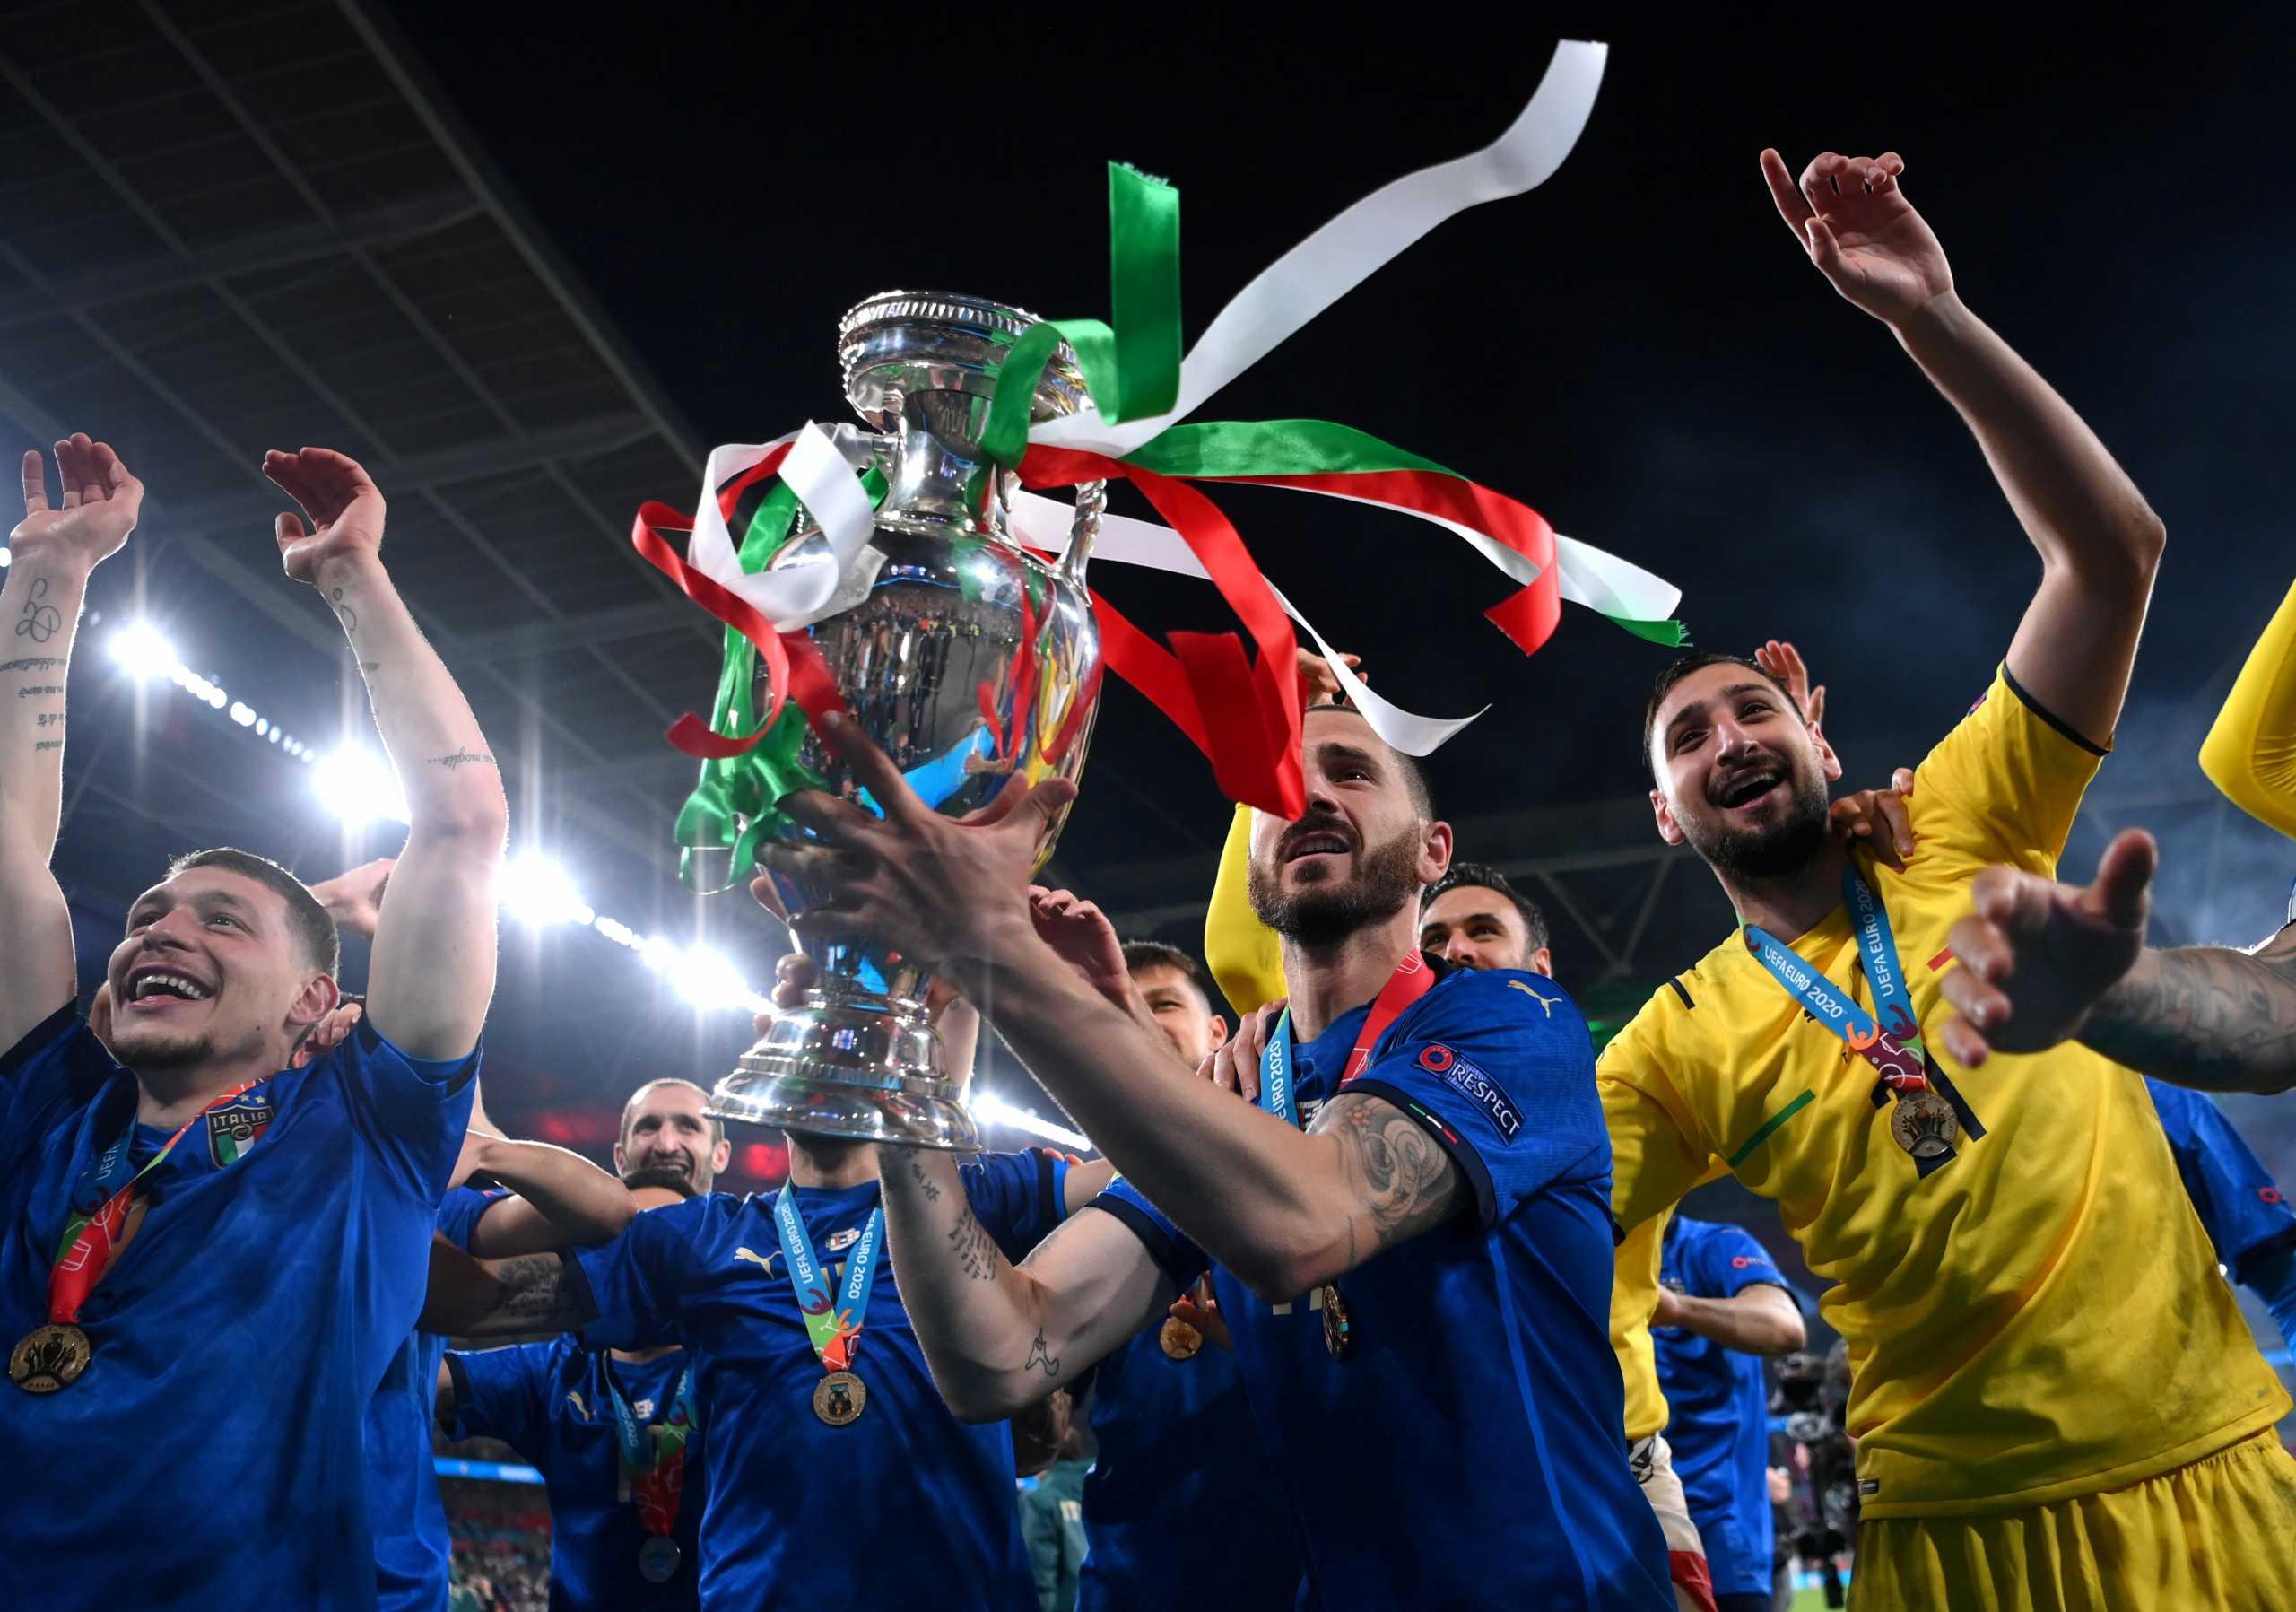 Euro 2020 – Ιταλία: Οι πανηγυρισμοί στα αποδυτήρια και η απίστευτη βουτιά του Ντε Ρόσι